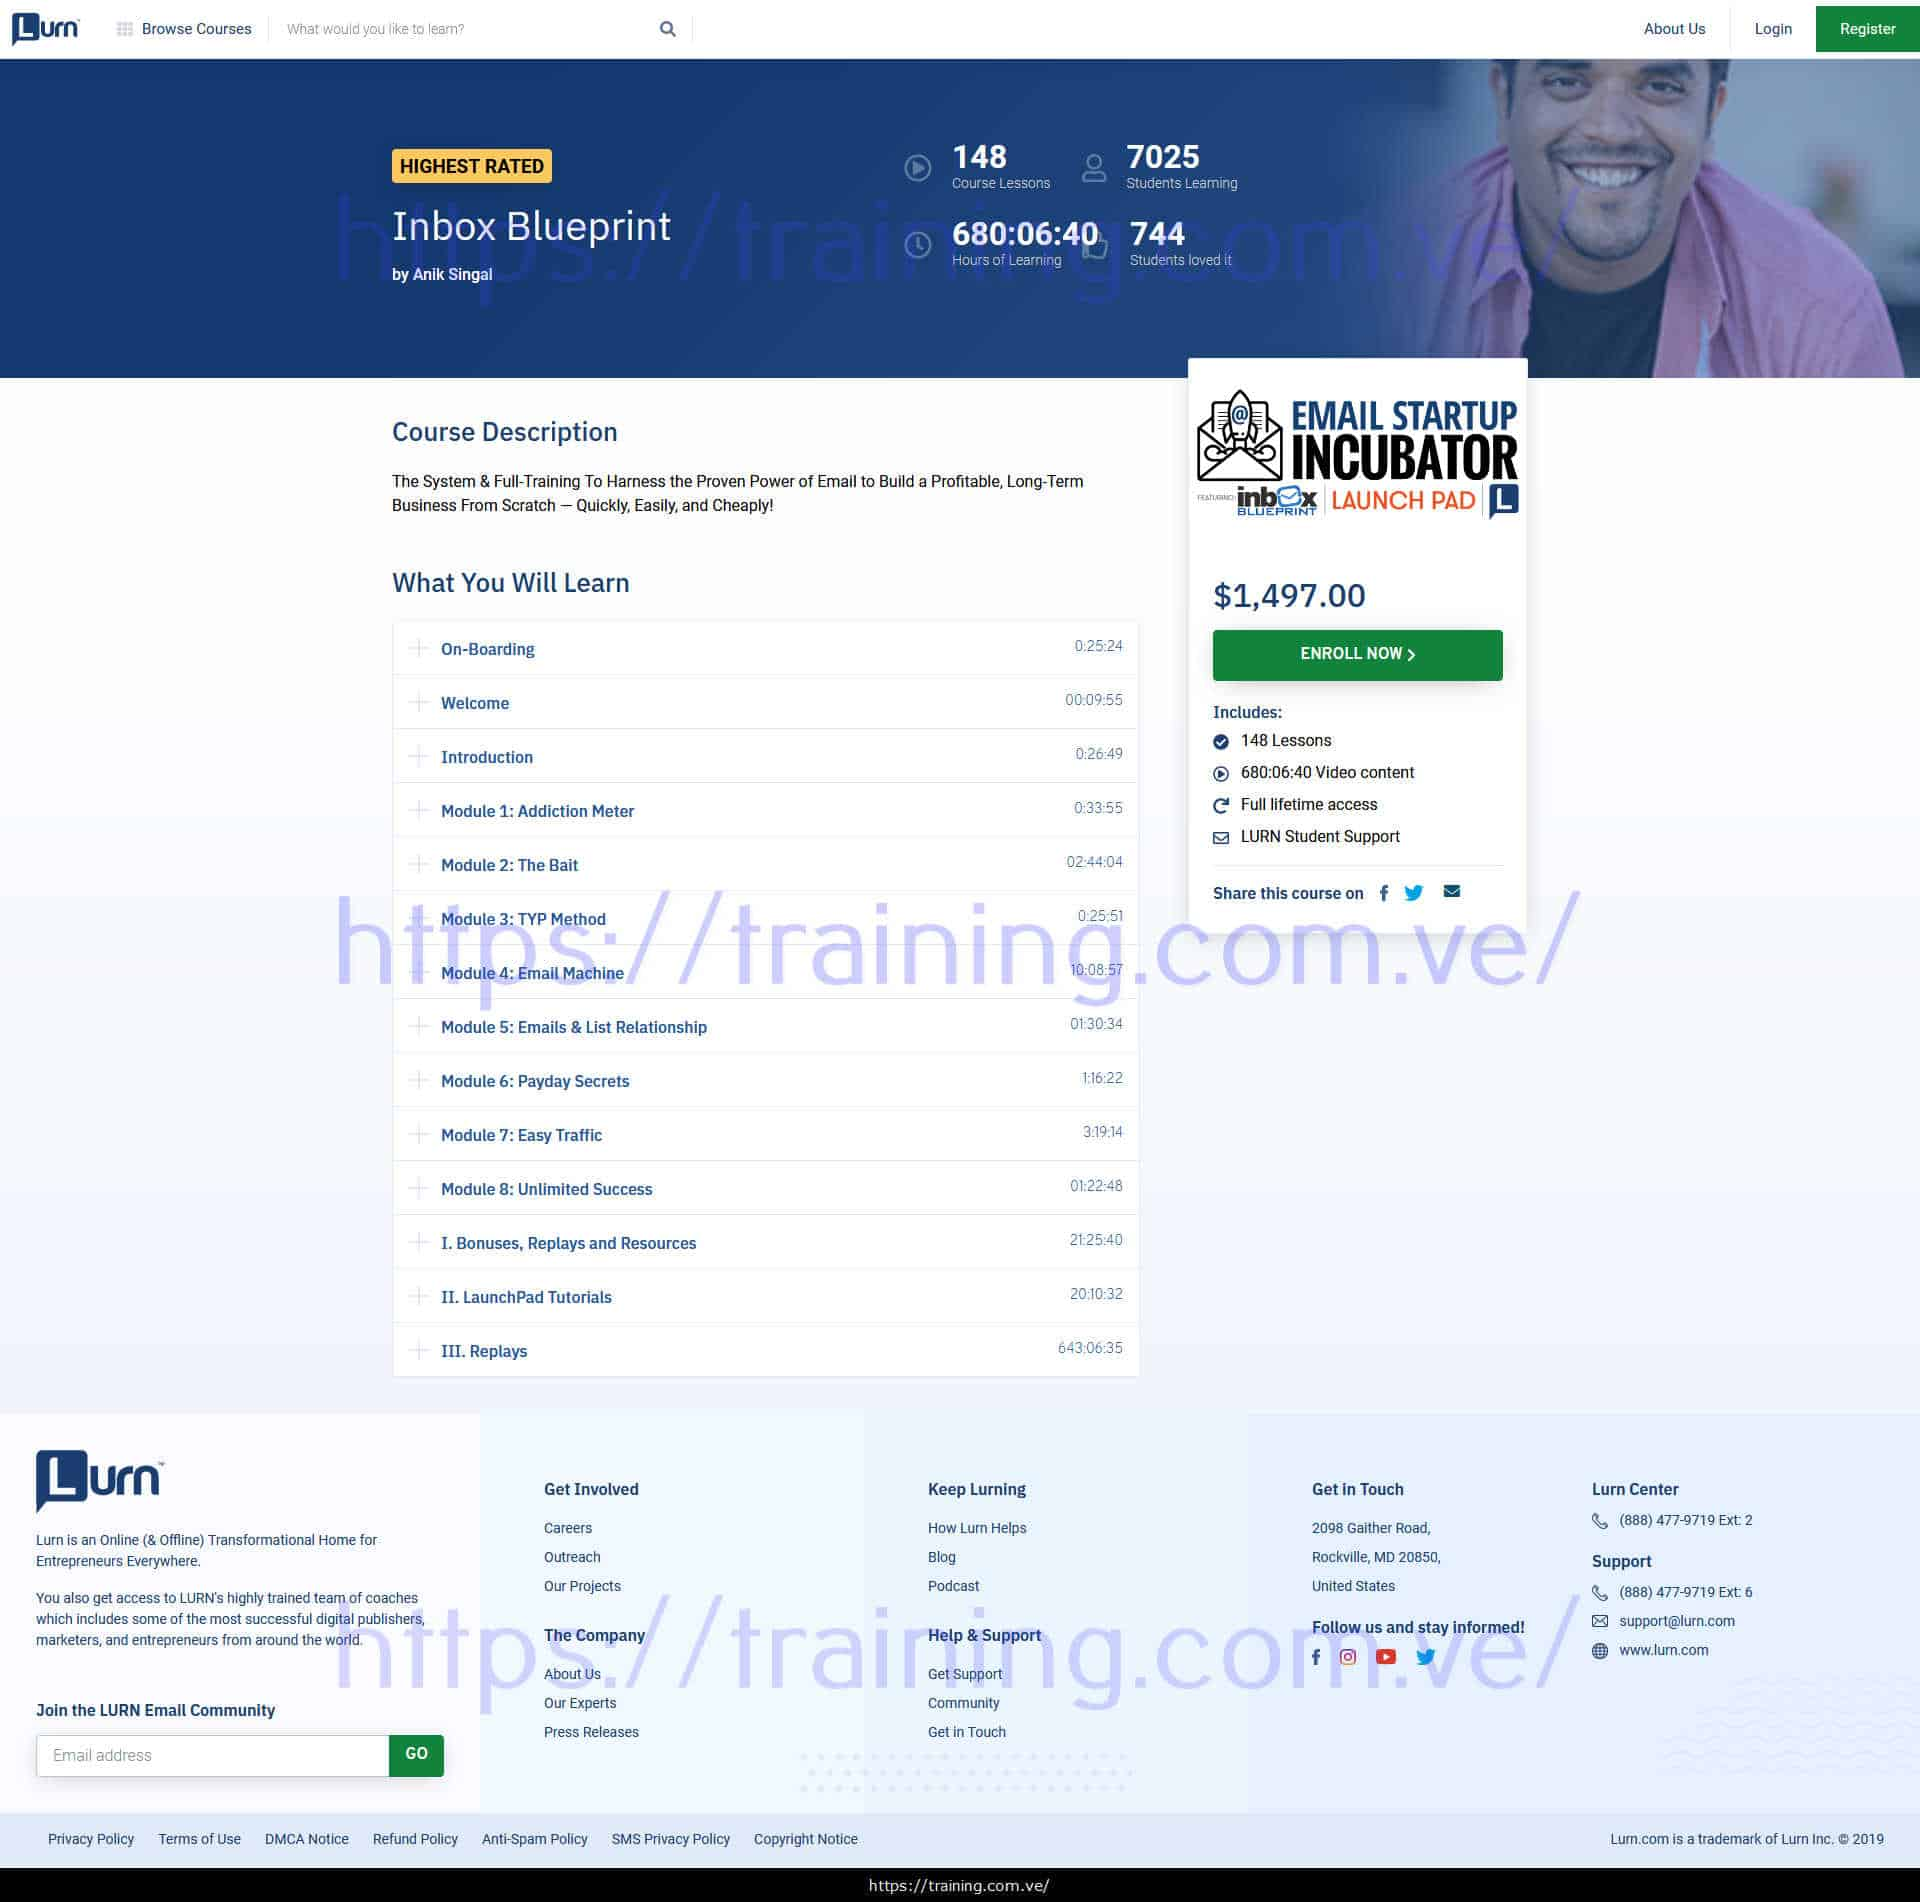 Inbox Blueprint by Anik Singal Buy